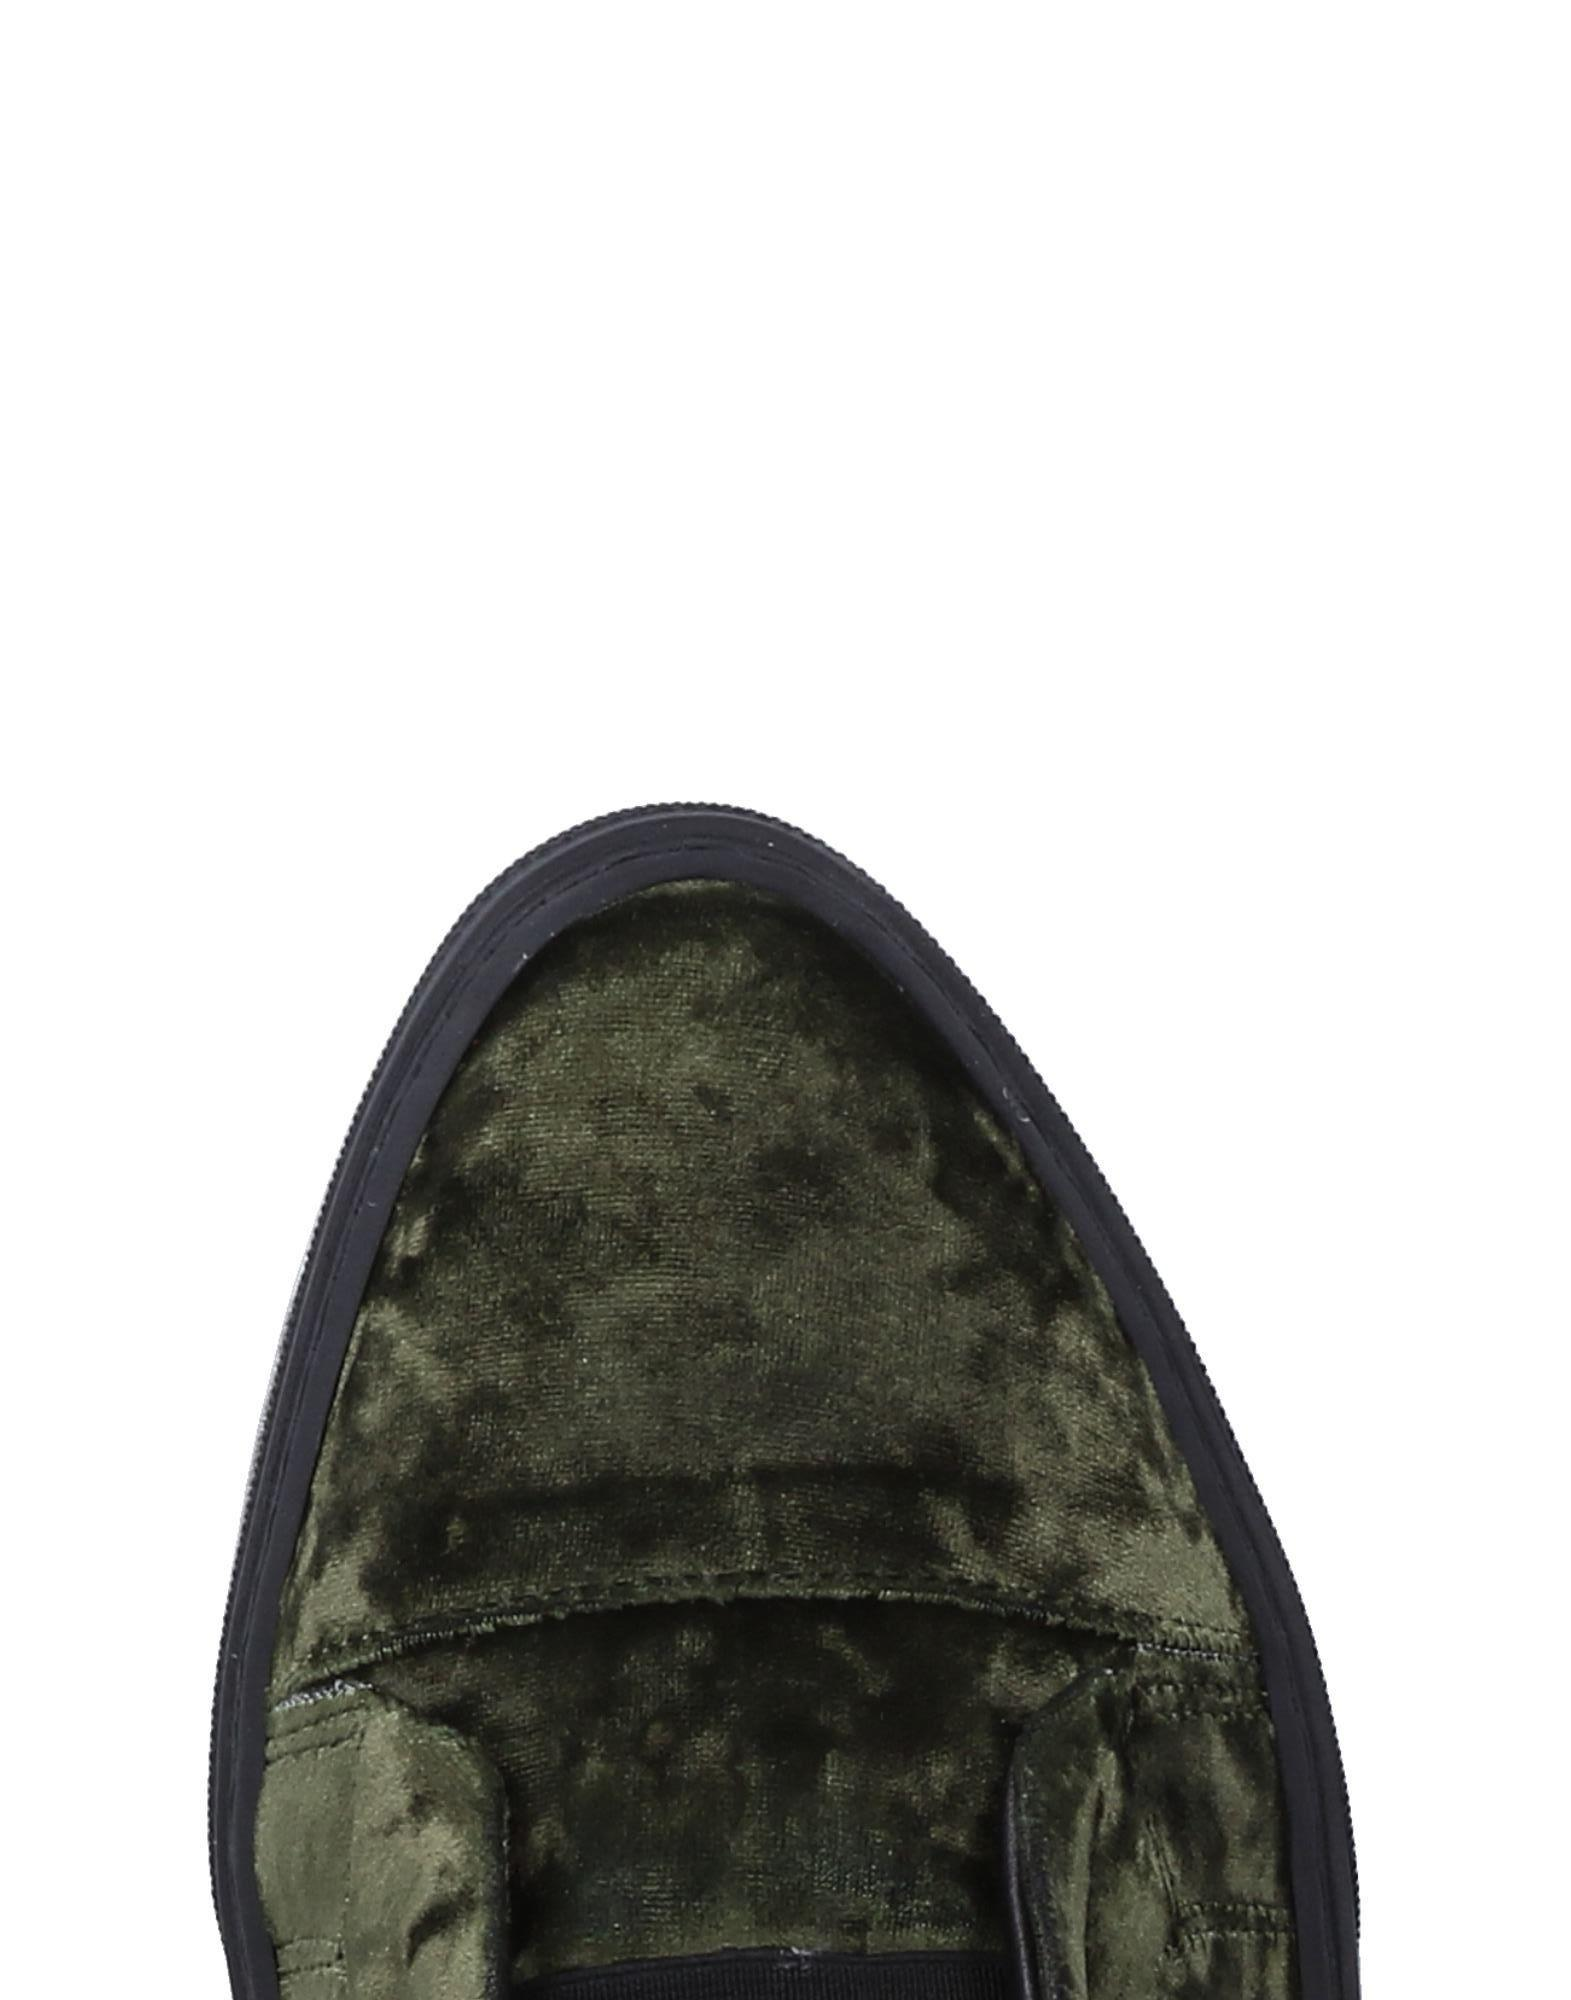 F.lli Bruglia Velvet Low-tops & Sneakers in Military Green (Green)